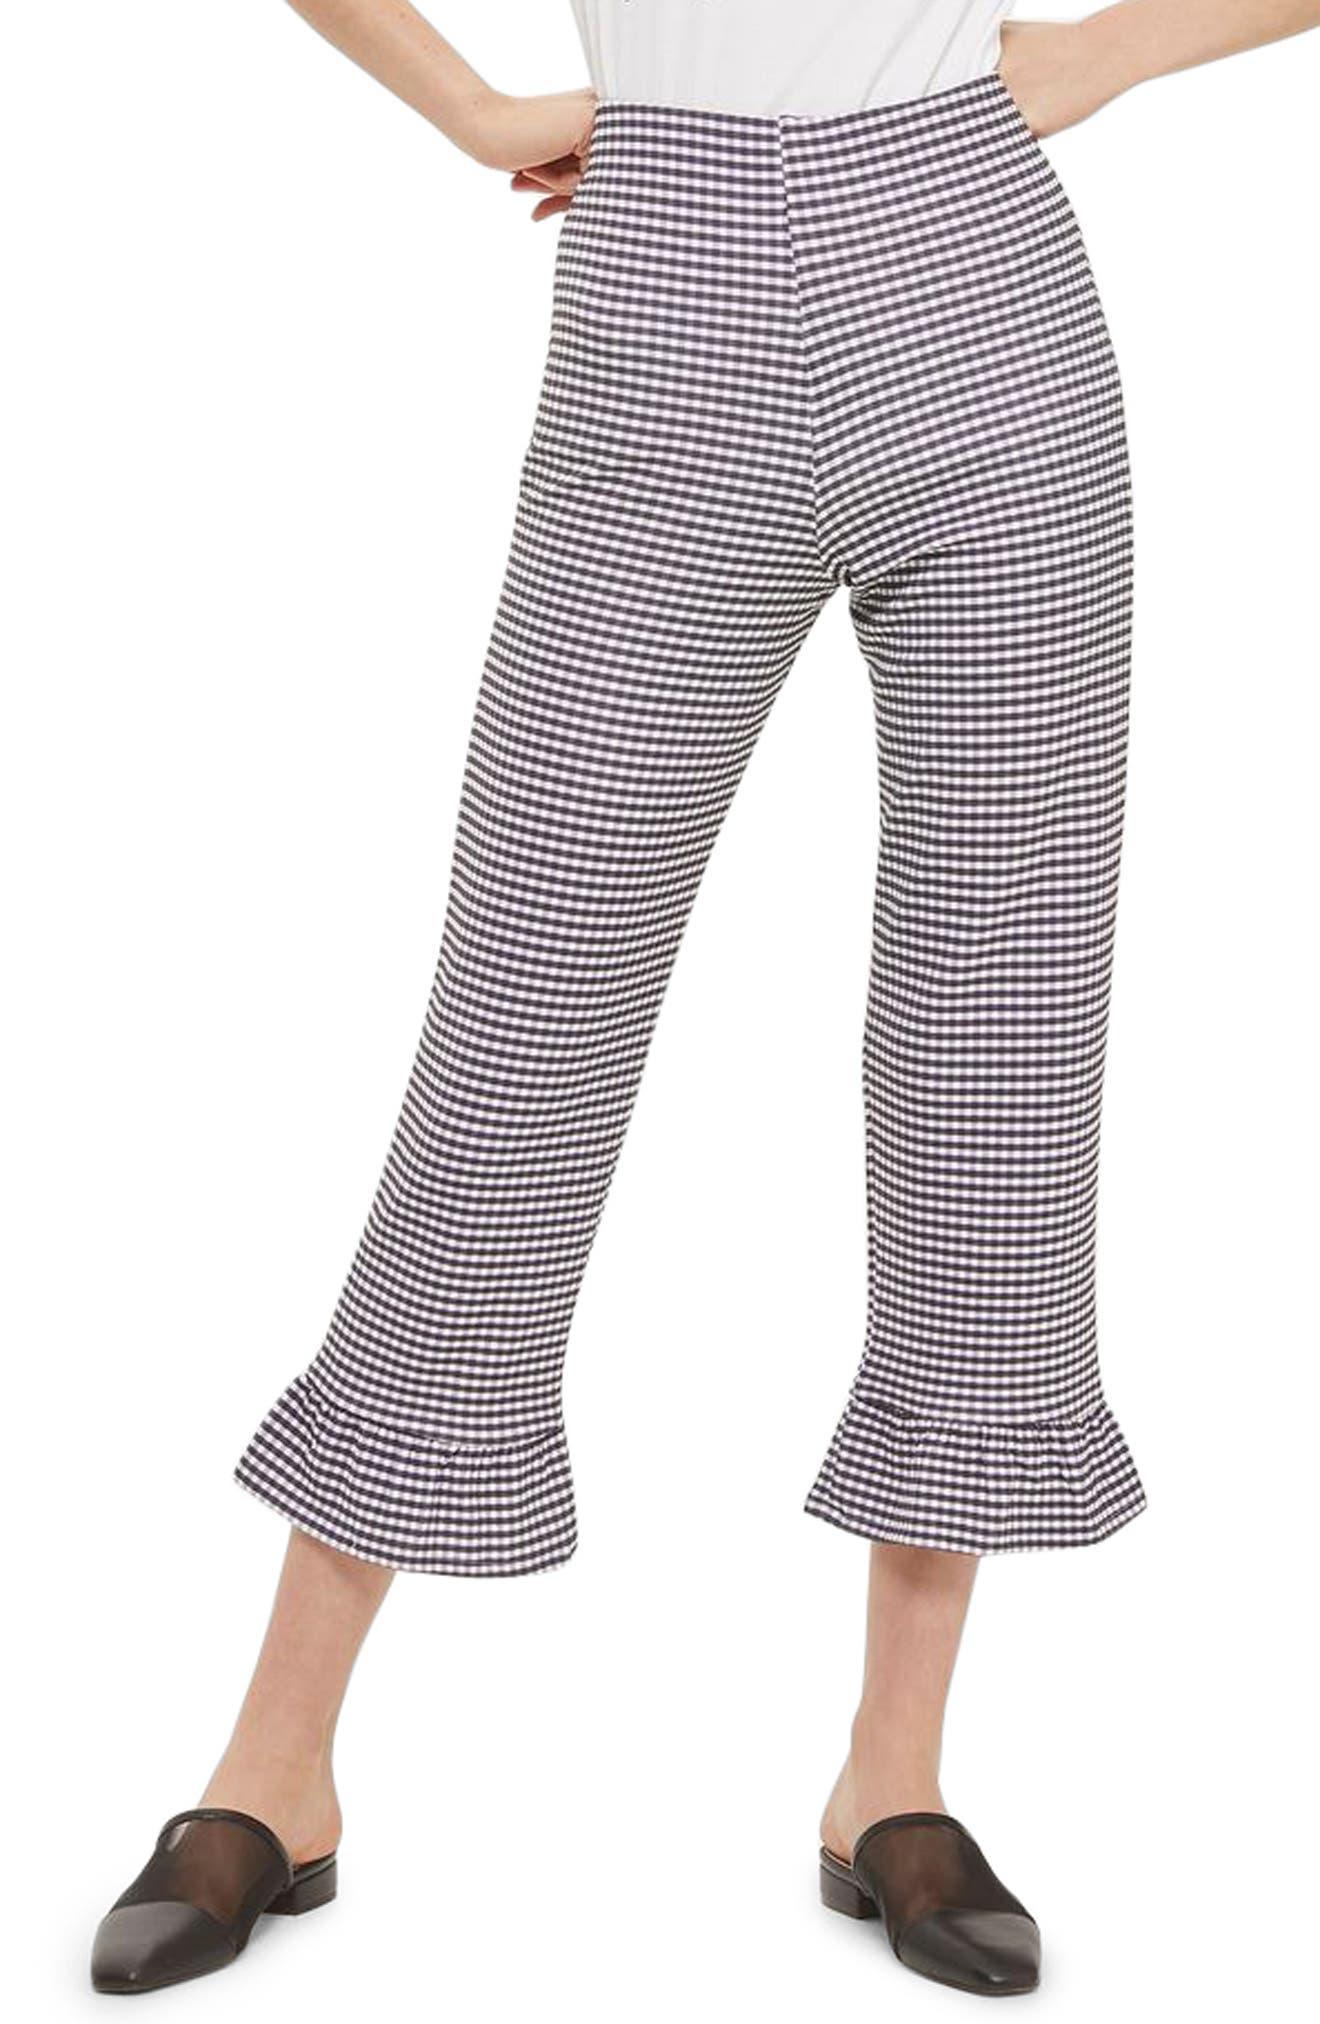 Topshop Gingham Ruffle Capri Trousers